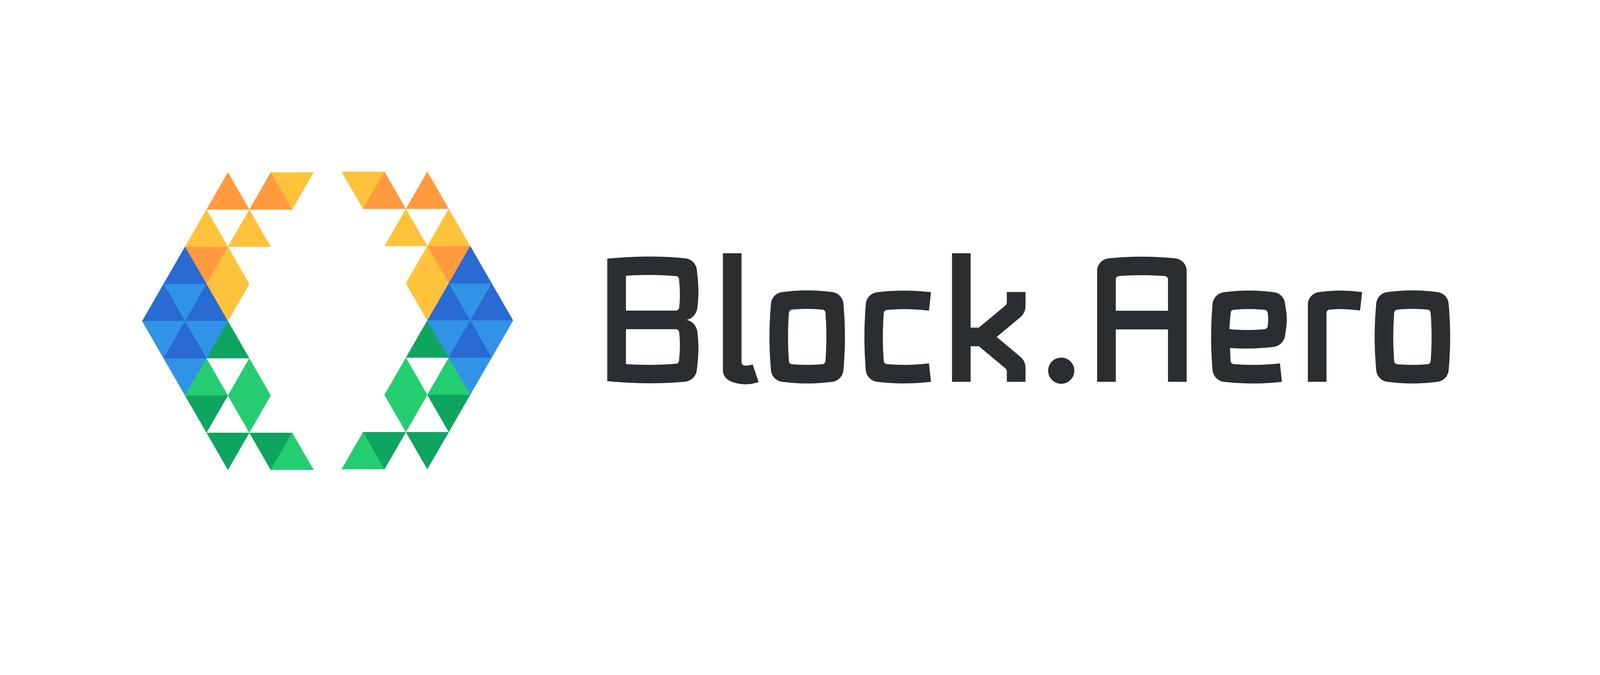 Block_Aero_Final-01_preview